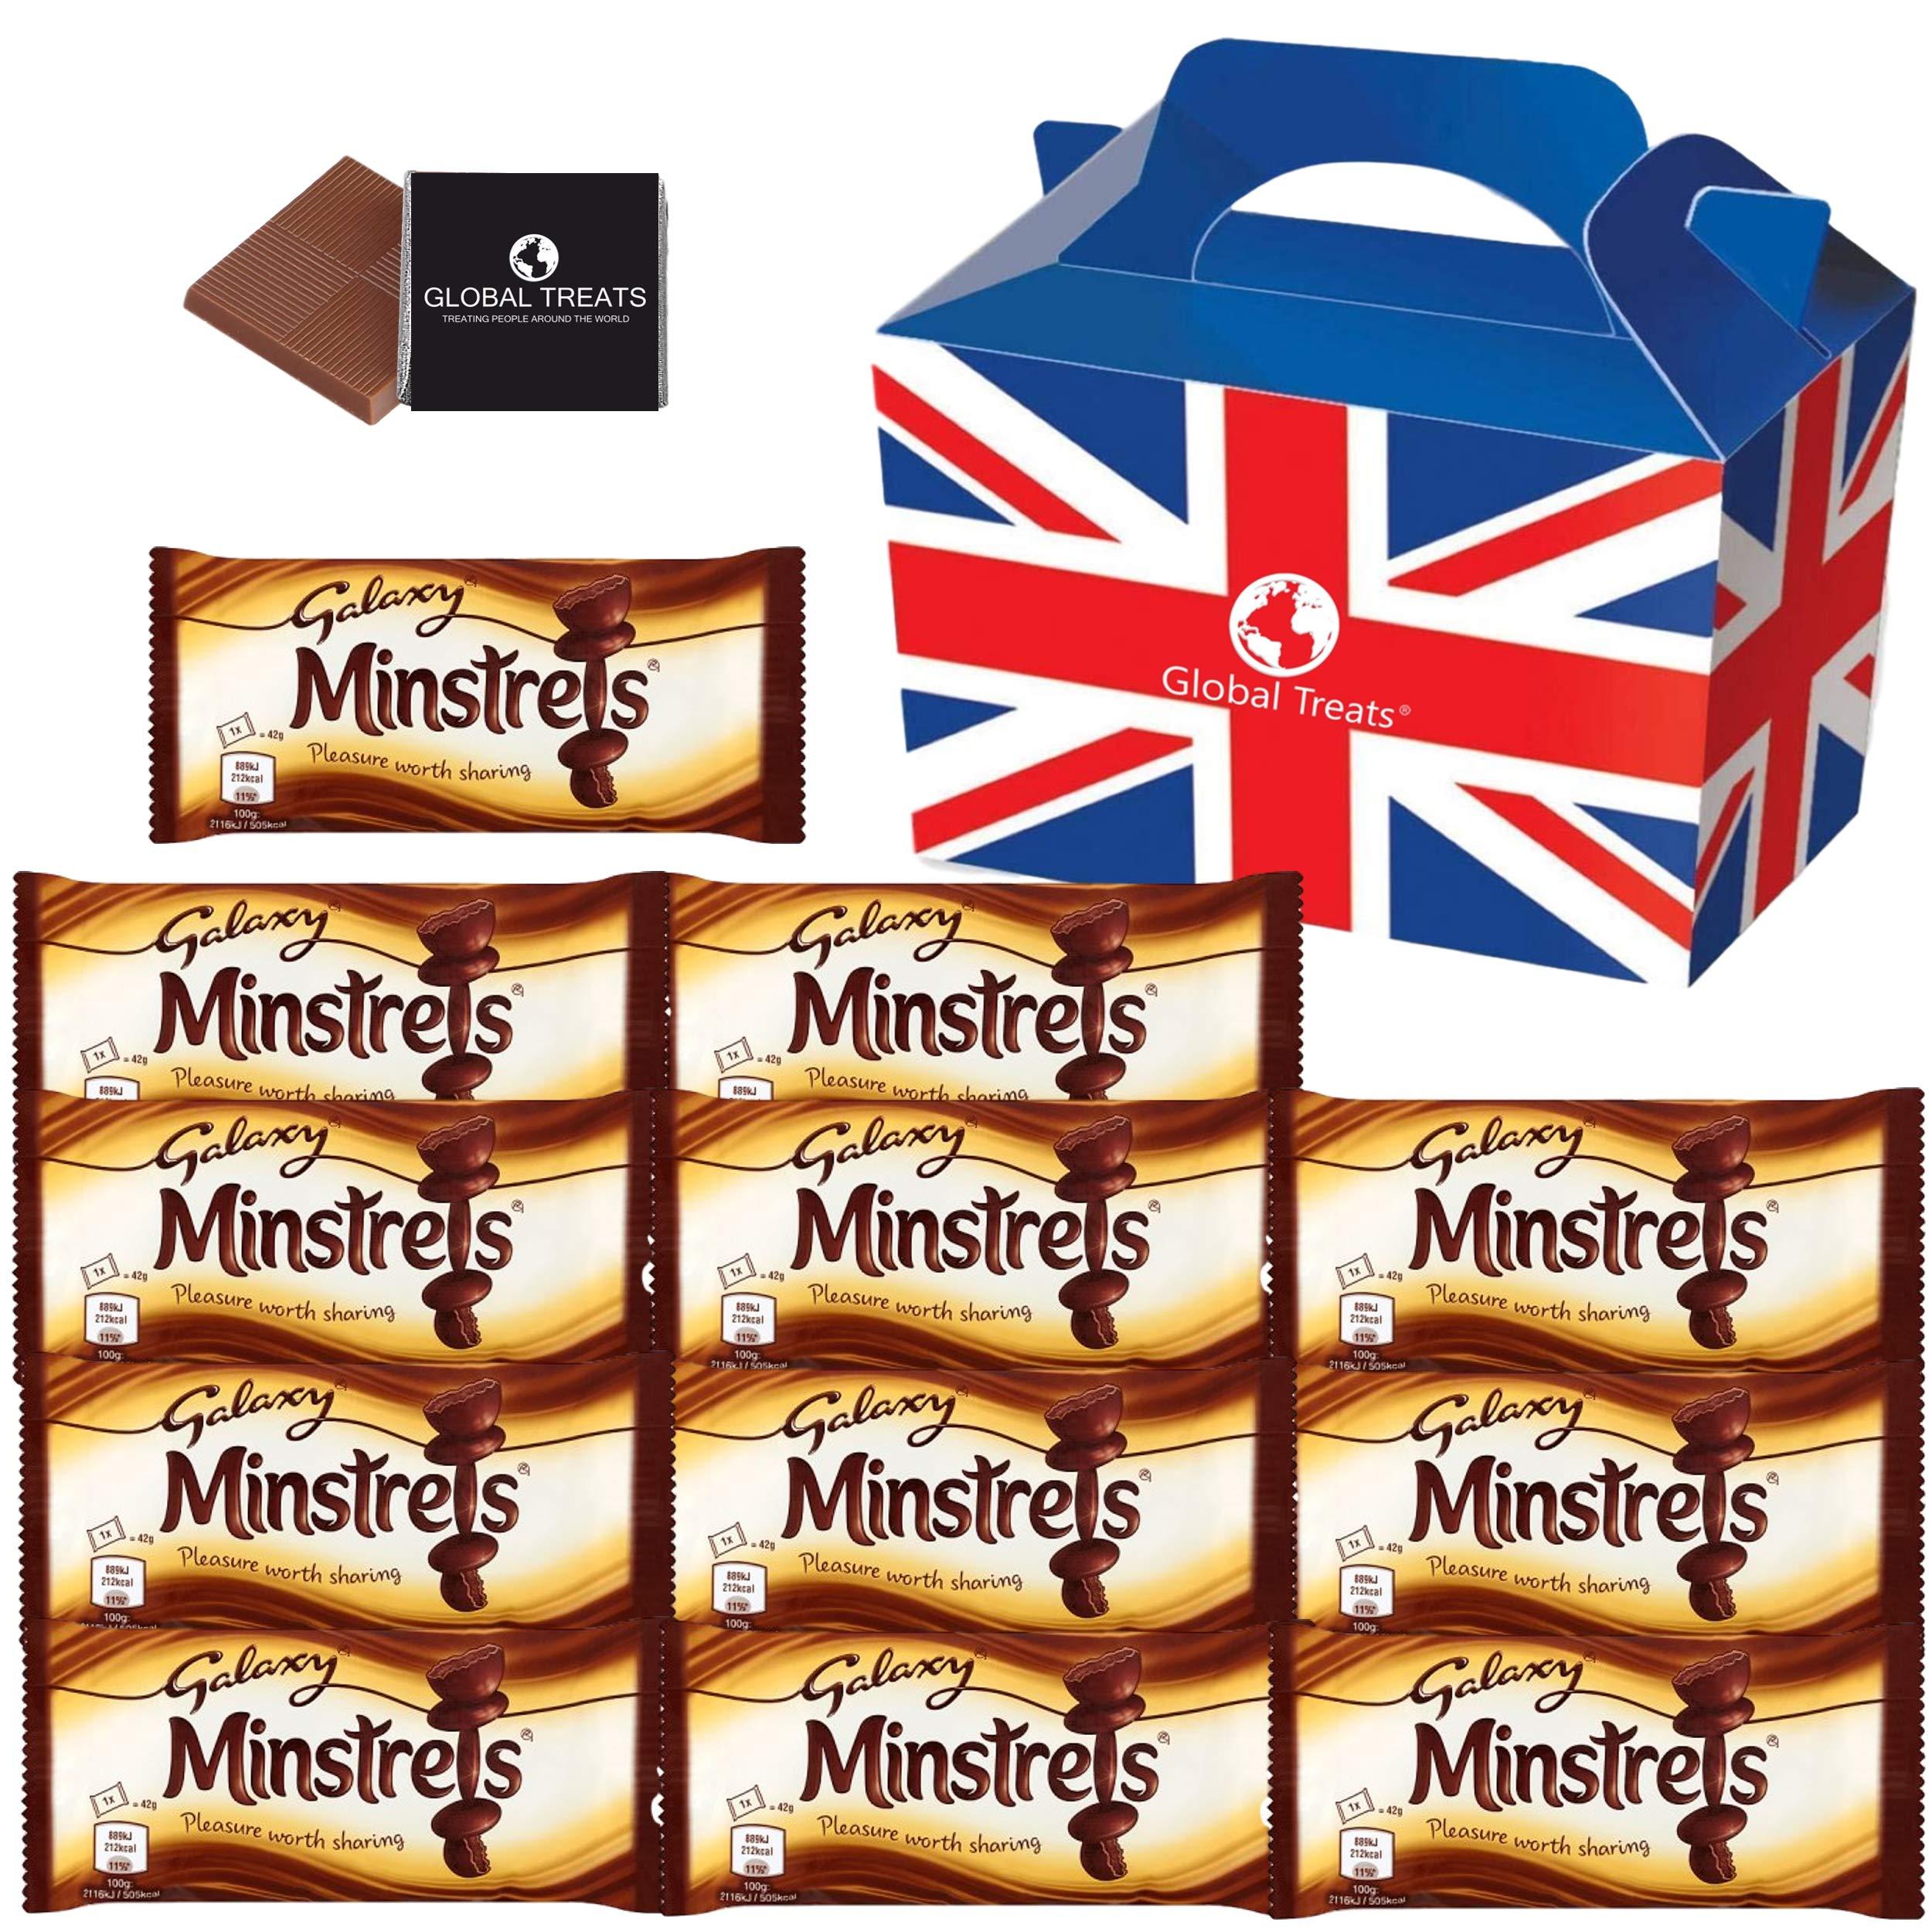 Minstrels - British Chocolate Candy Gift Box - Minstrels 42g x12 FULL SIZE Minstrels Chocolate Candy in a unique Gift Box and a free British Chocolate.